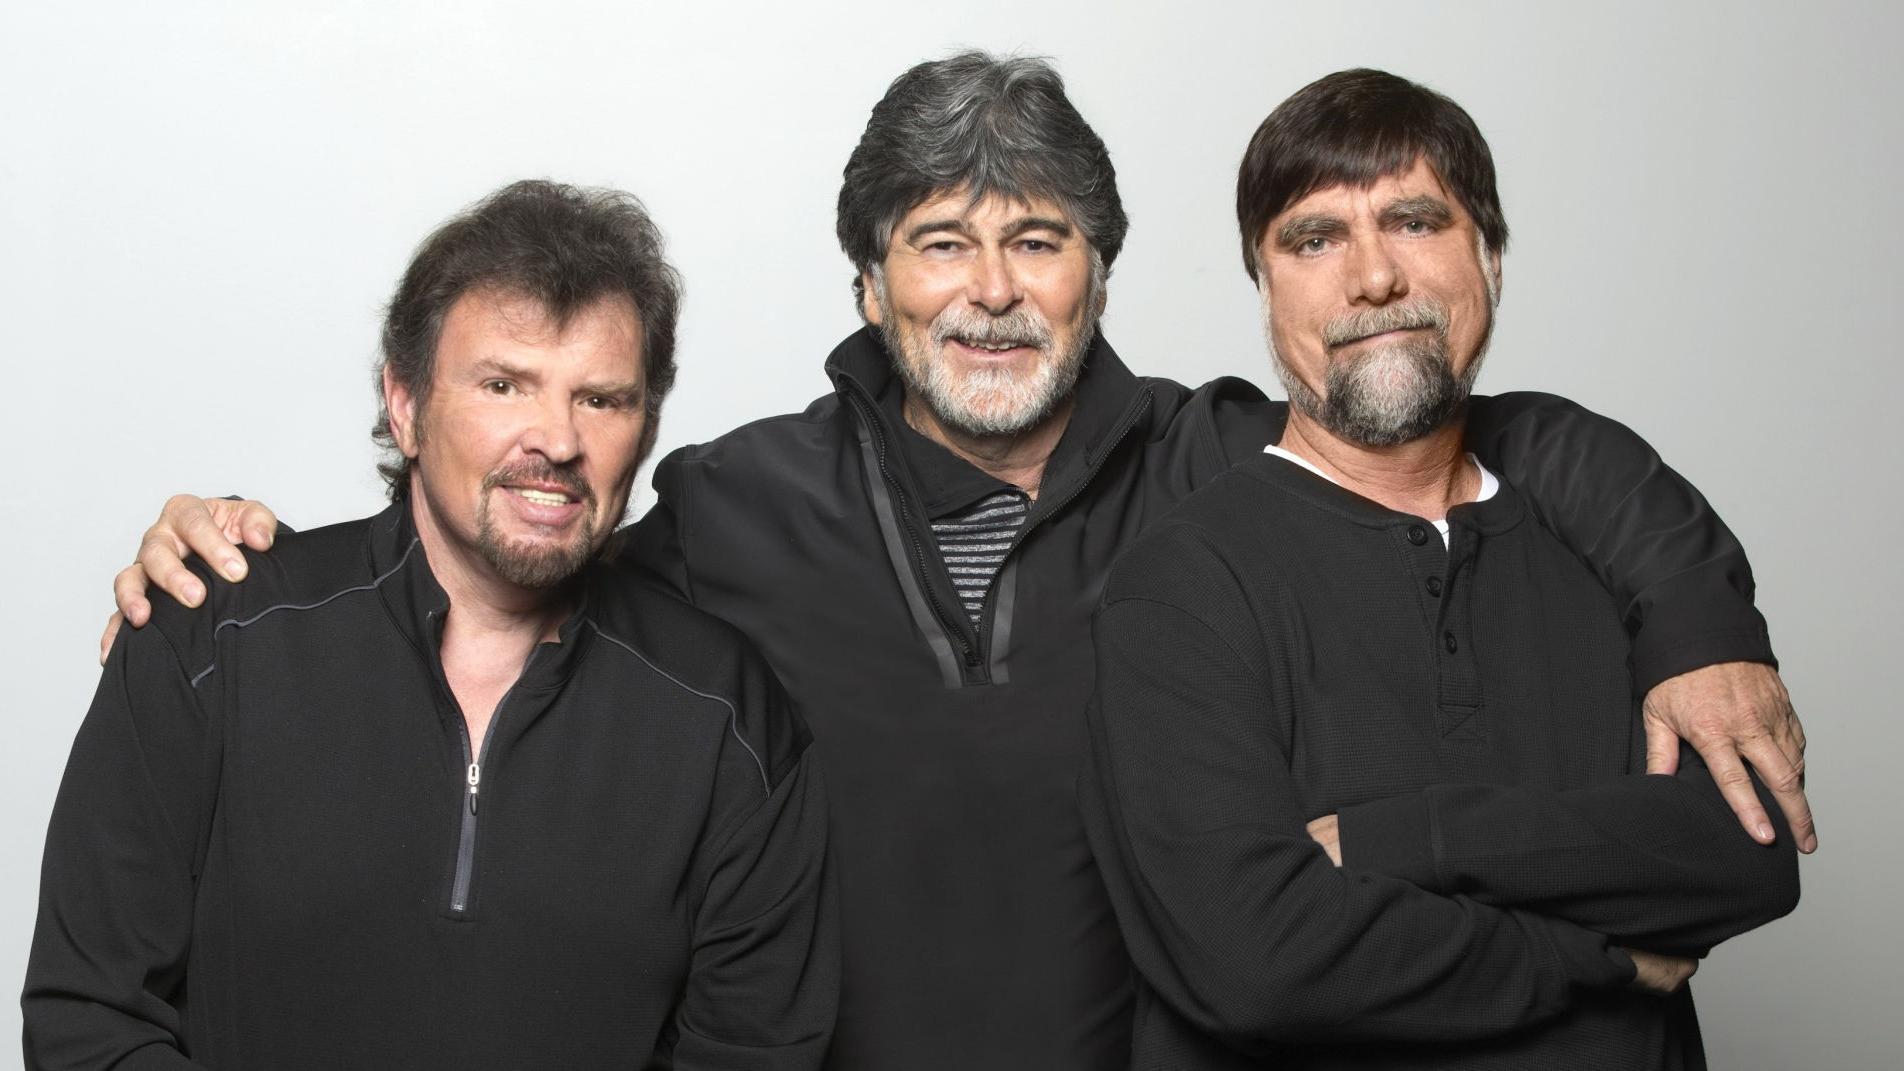 Top-notch entertainment lineup at 2016 Porter County Fair